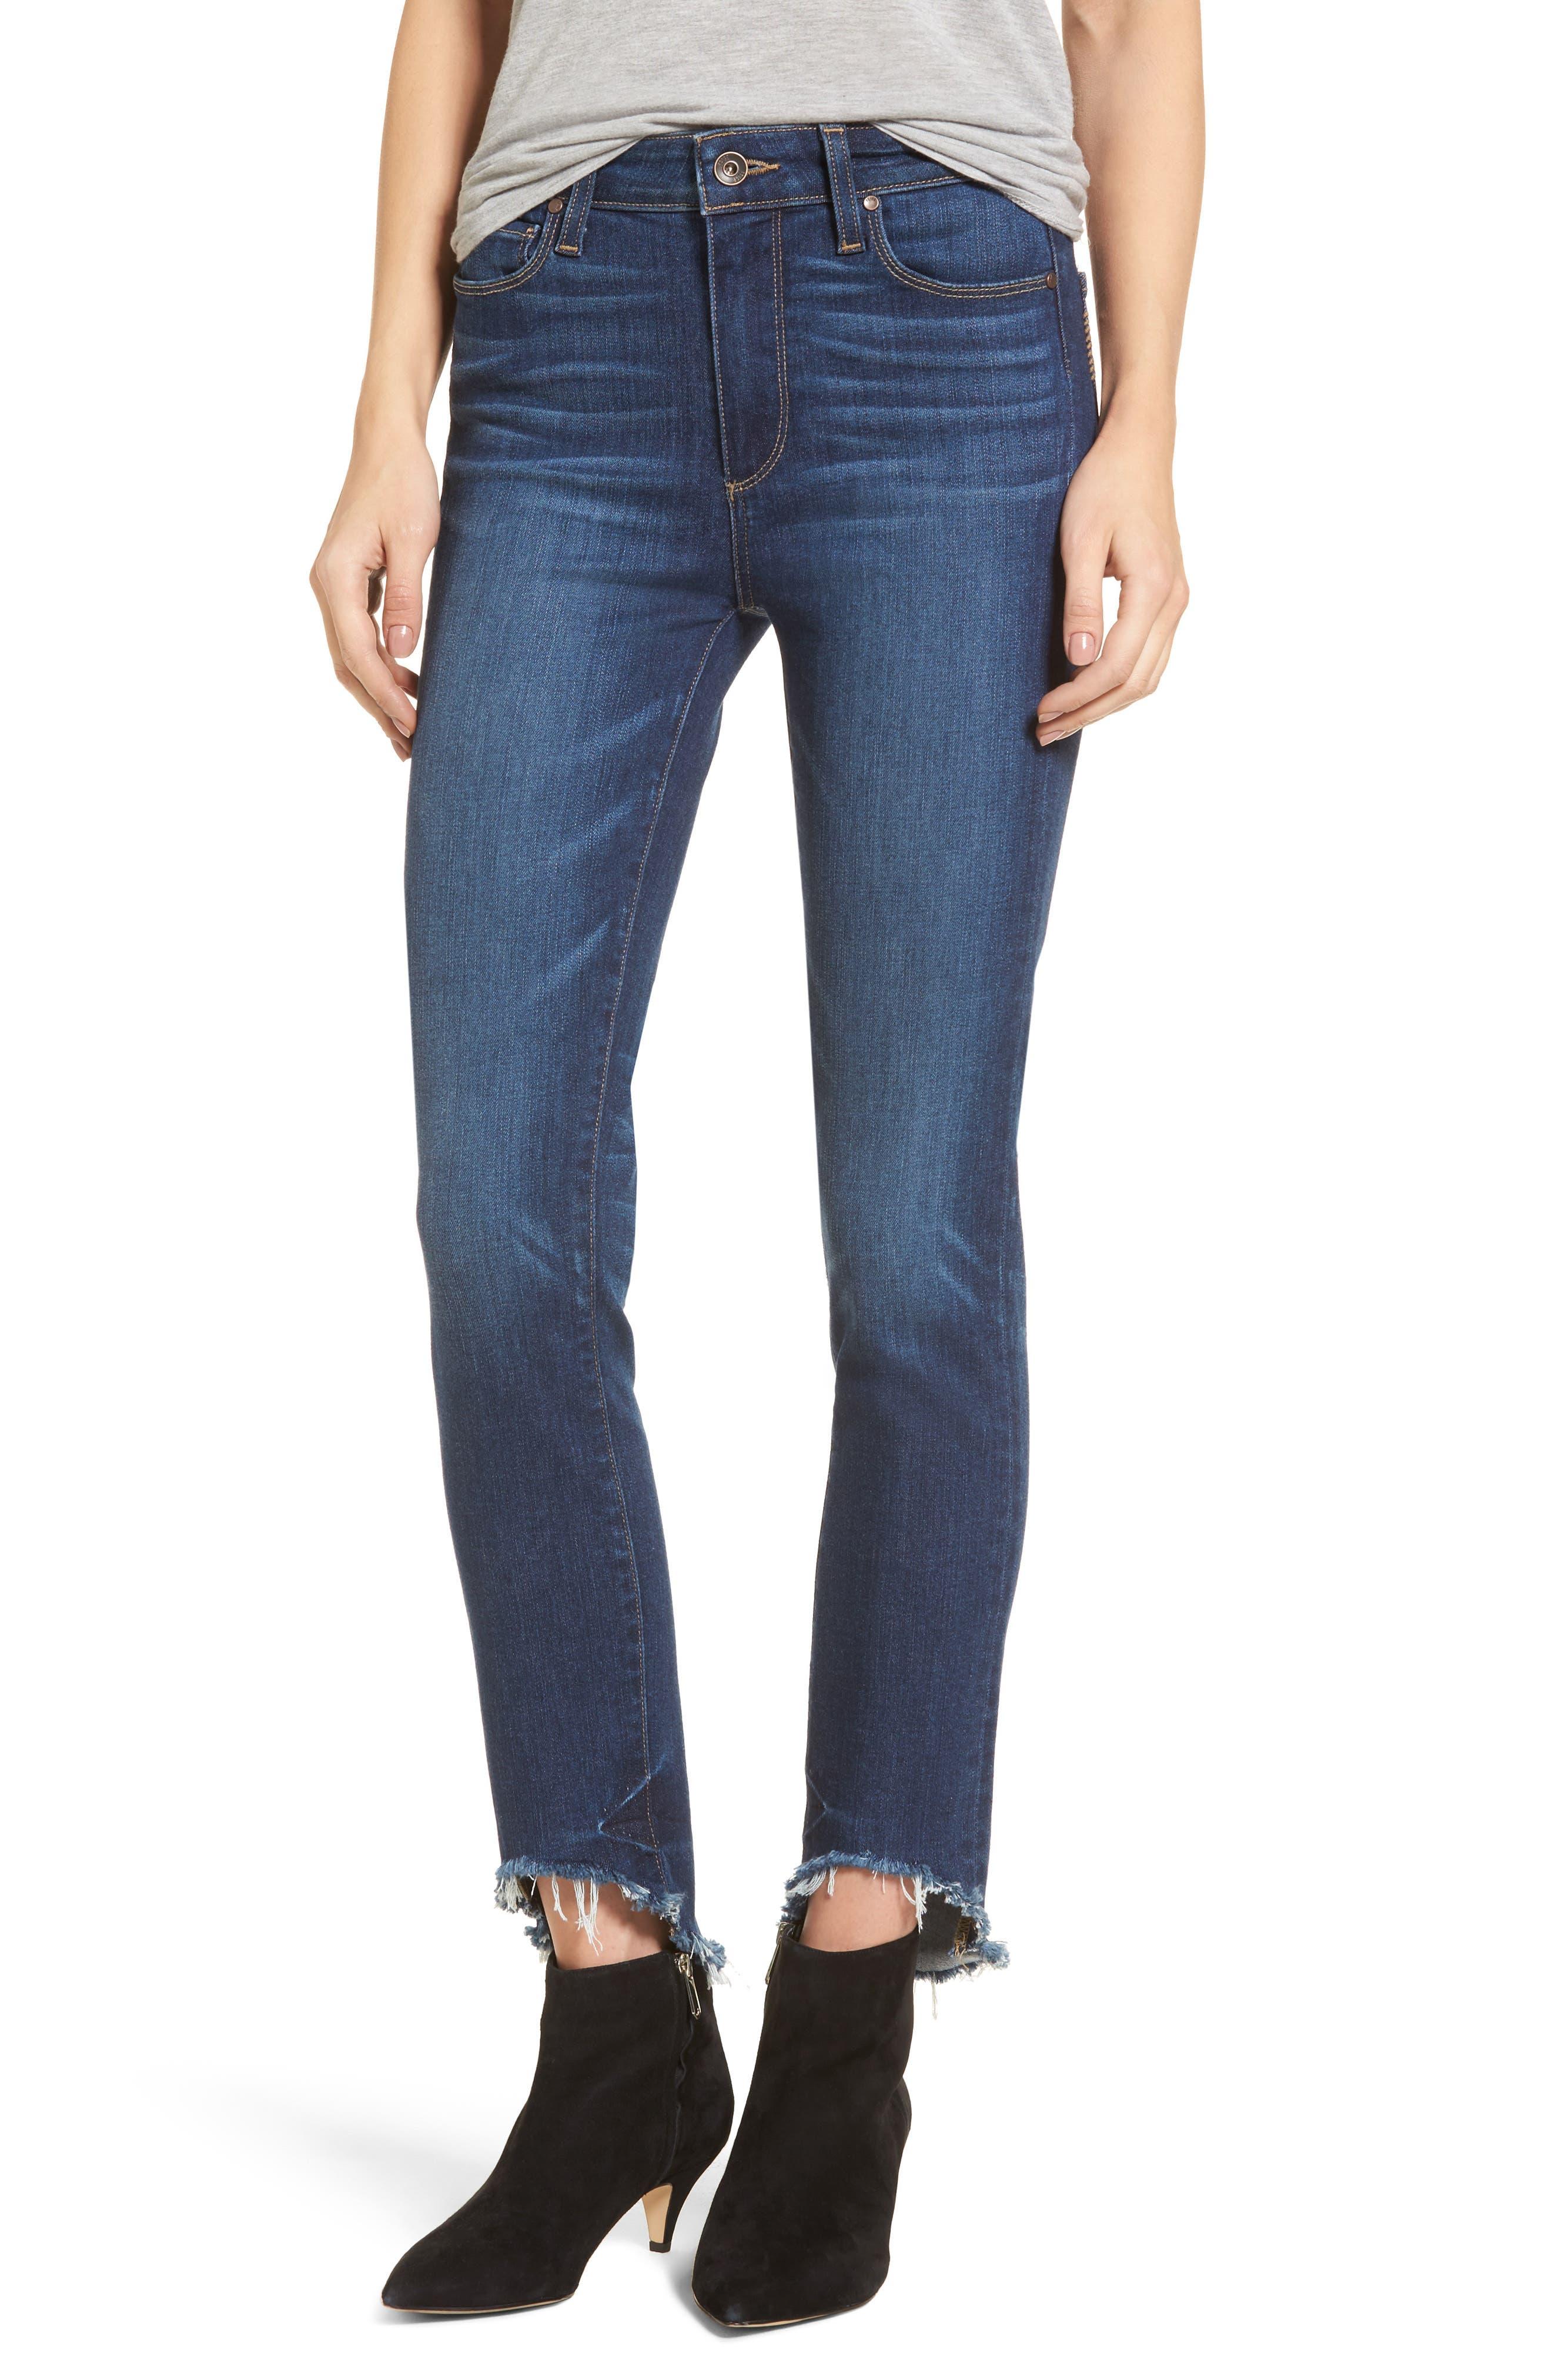 Transcend Vintage - Hoxton High Waist Ankle Skinny Jeans,                             Main thumbnail 1, color,                             Auburn